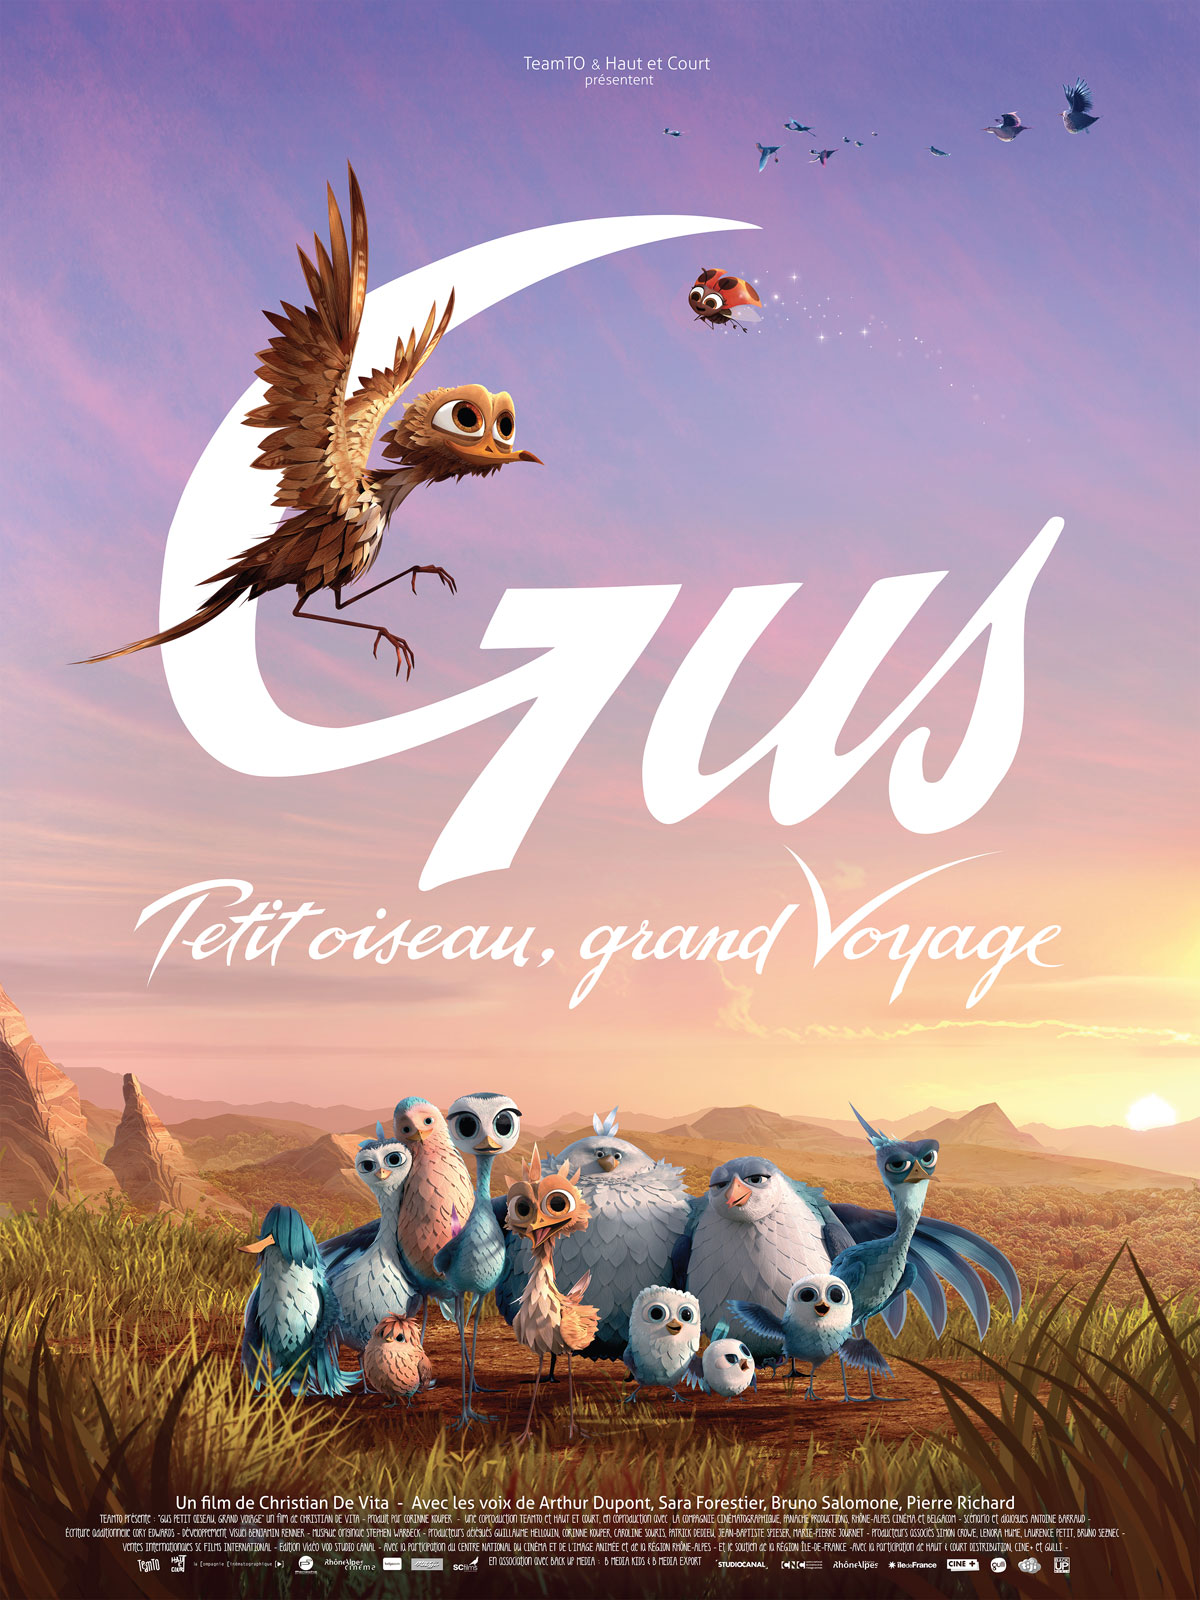 gus-petit-oiseau-grand-voyage1